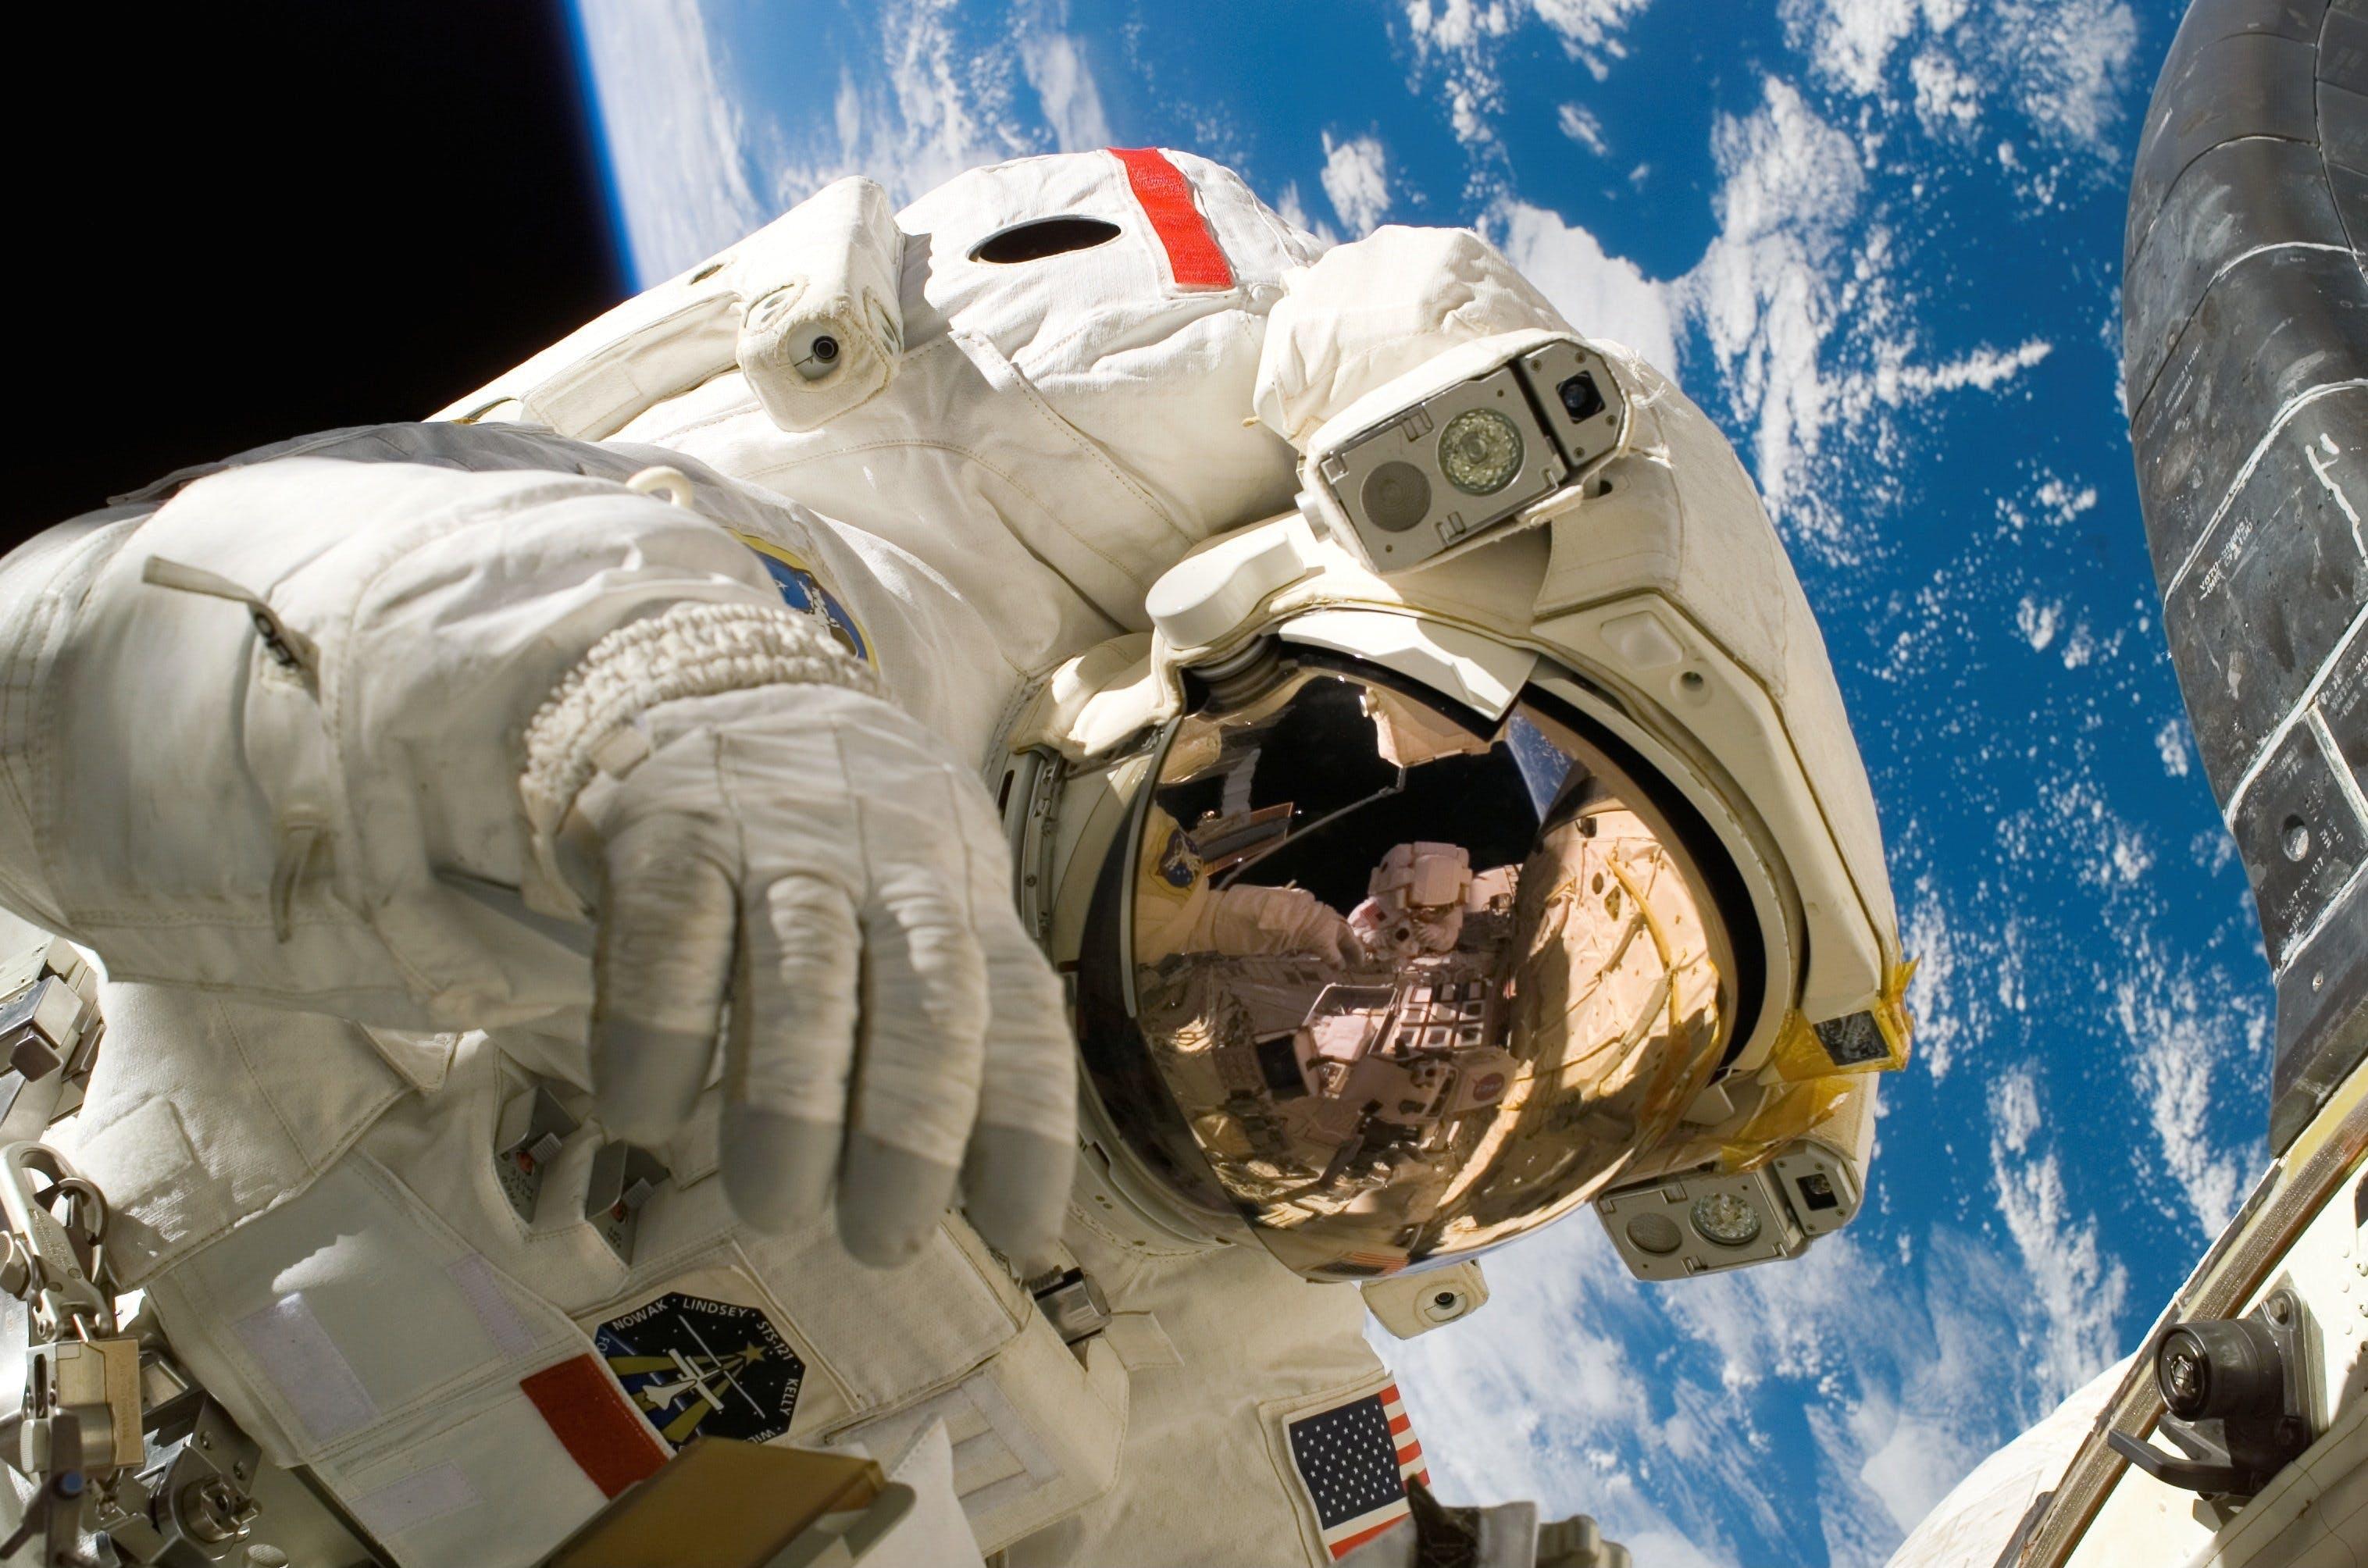 Звёздное небо и космос в картинках - Страница 10 Sky-earth-space-working